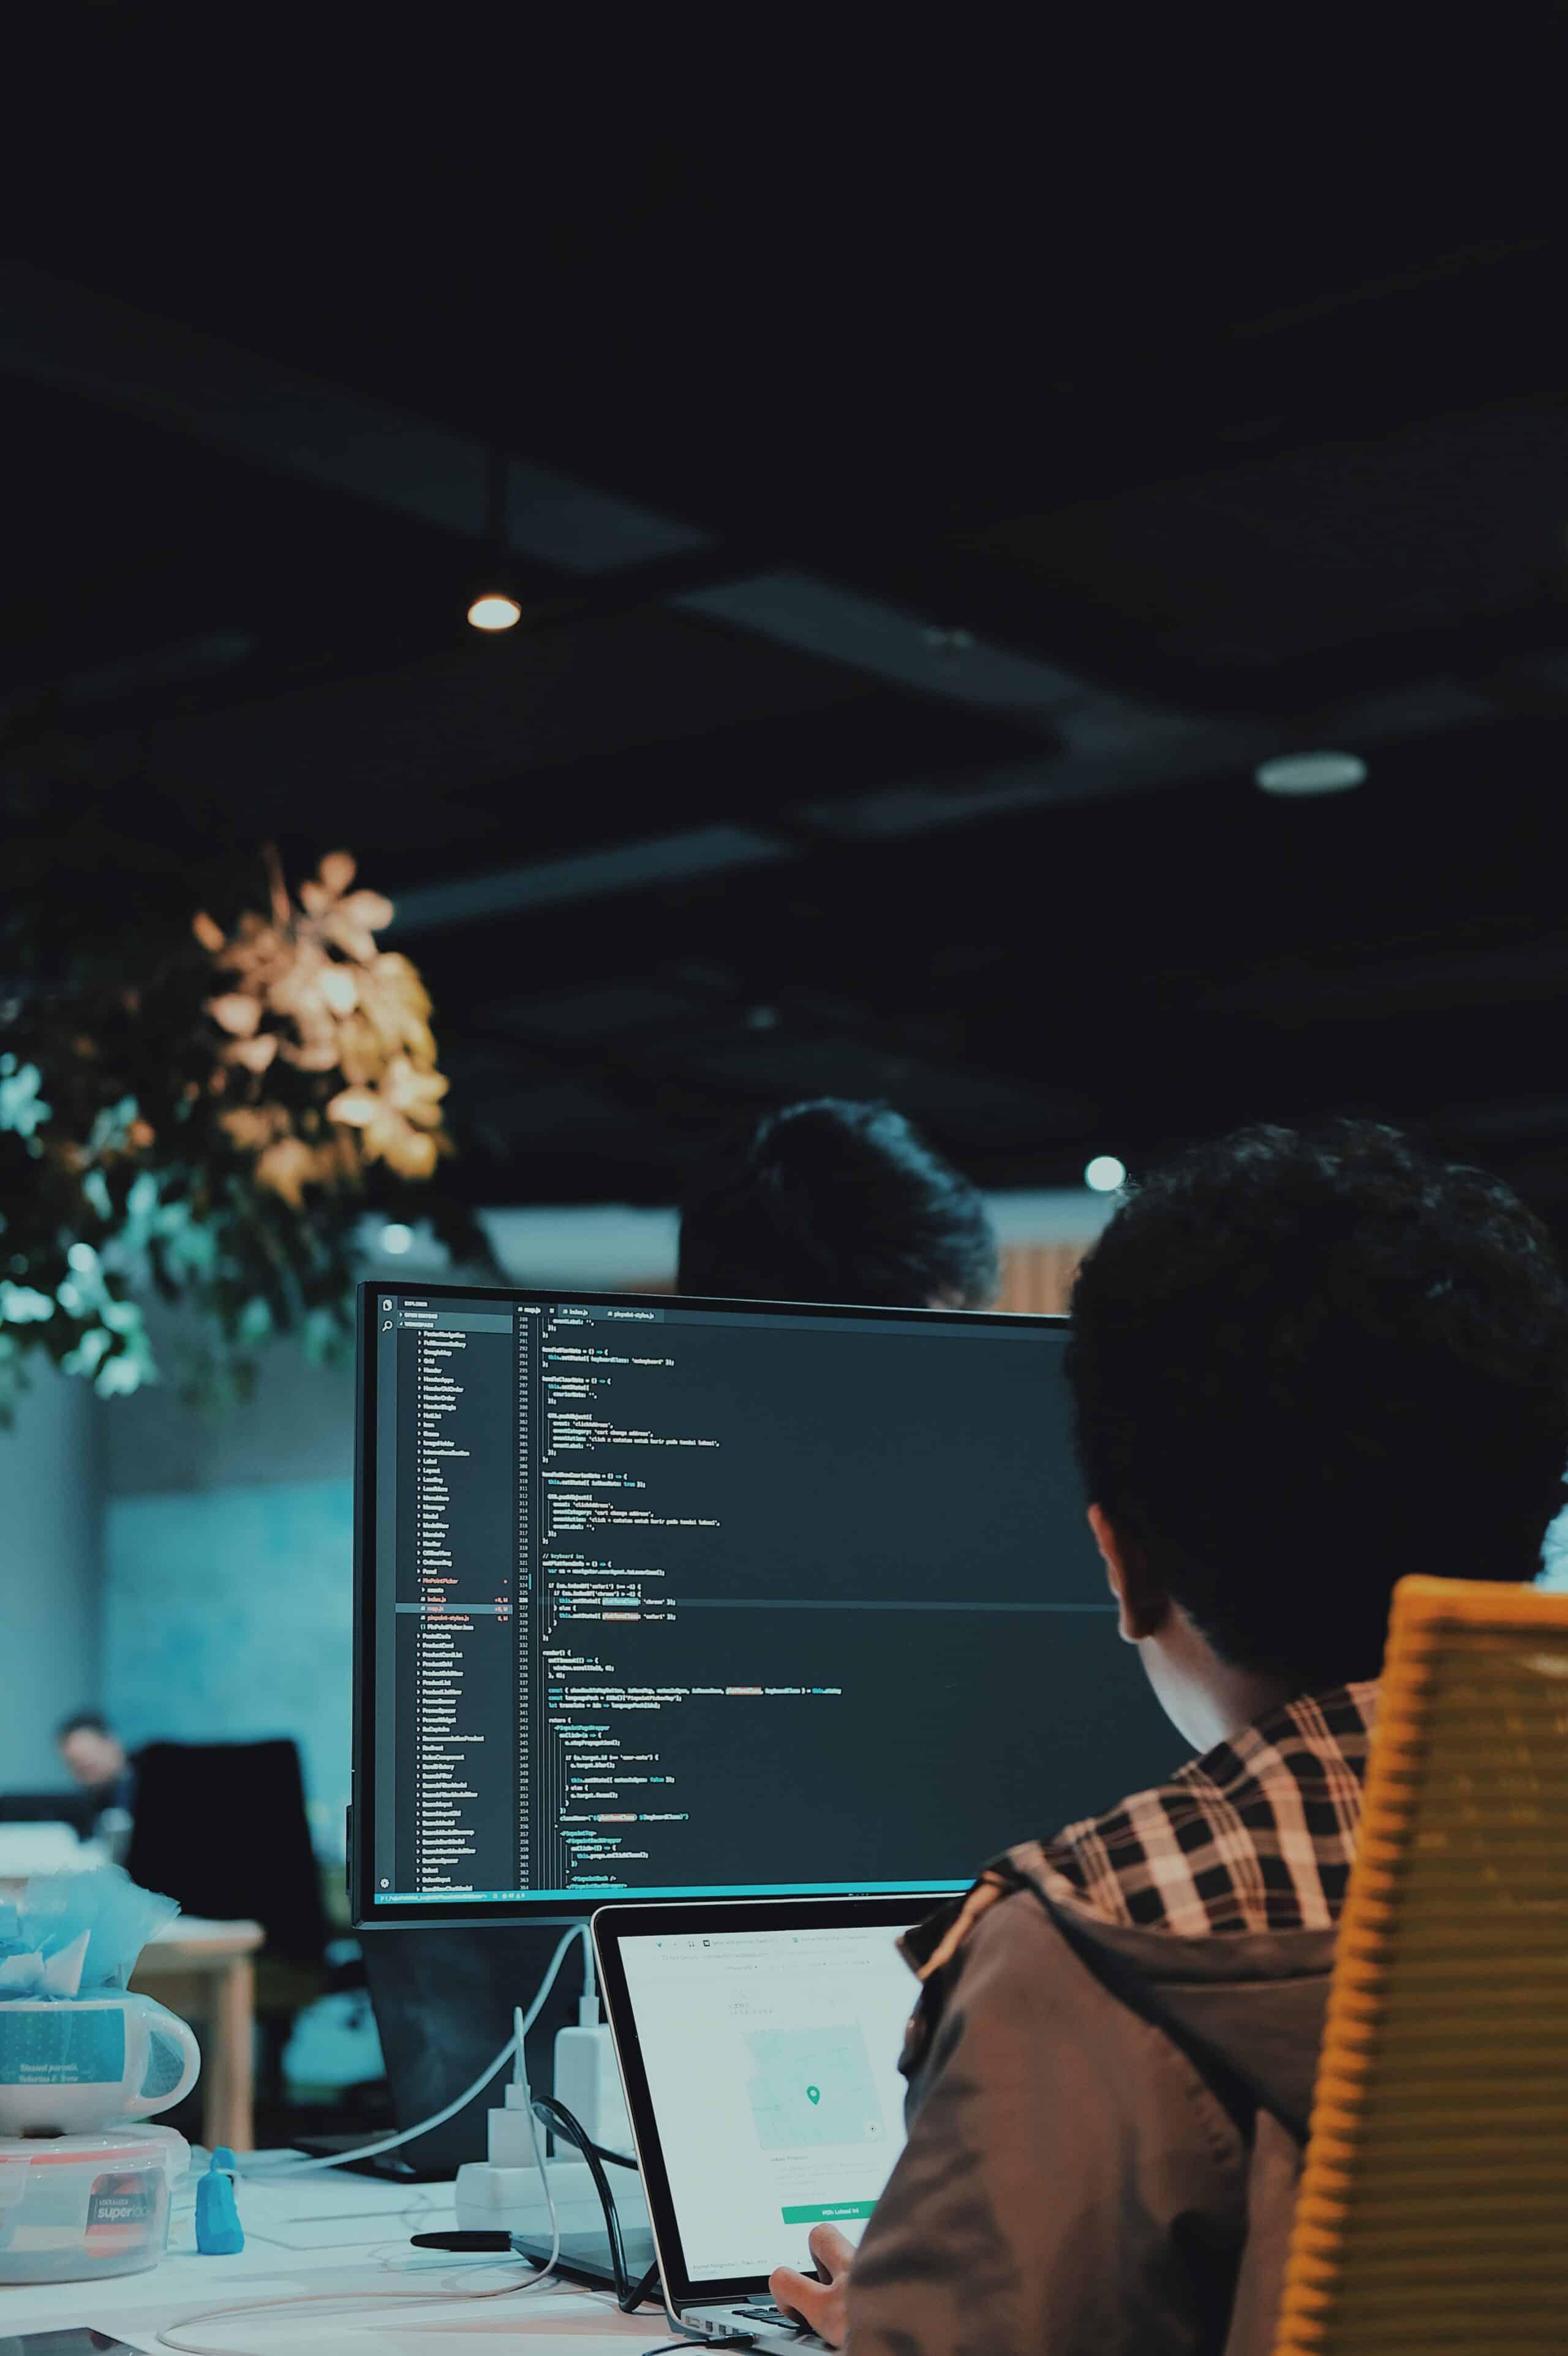 Java Framework Hadoop Coding Image